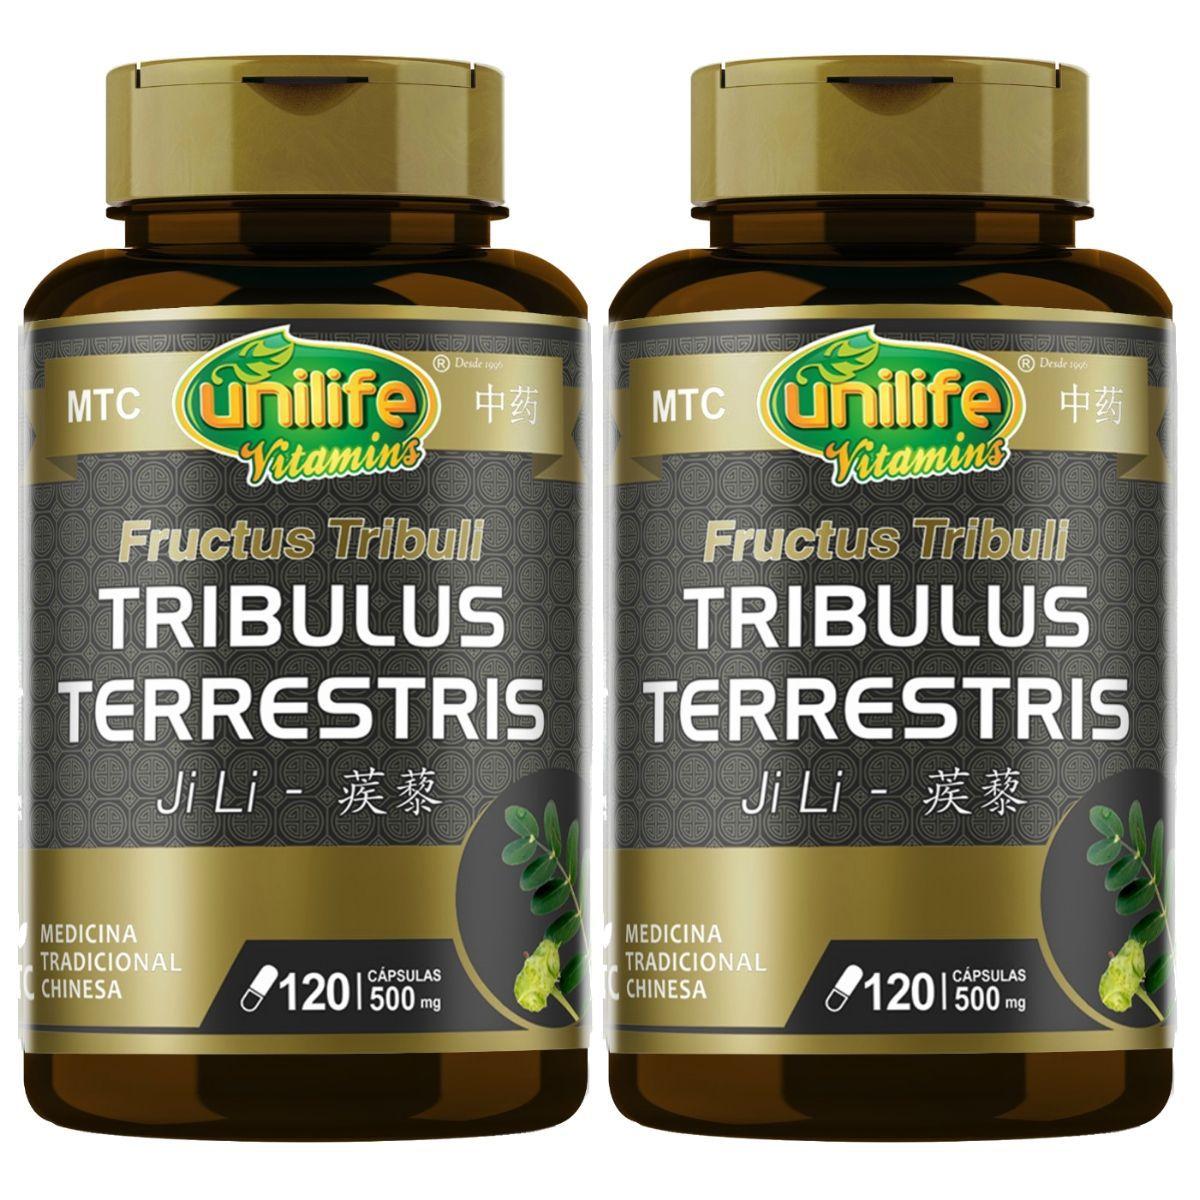 Kit 2 Tribulus Terrestris MTC 500mg 120 Cápsulas - Unilife